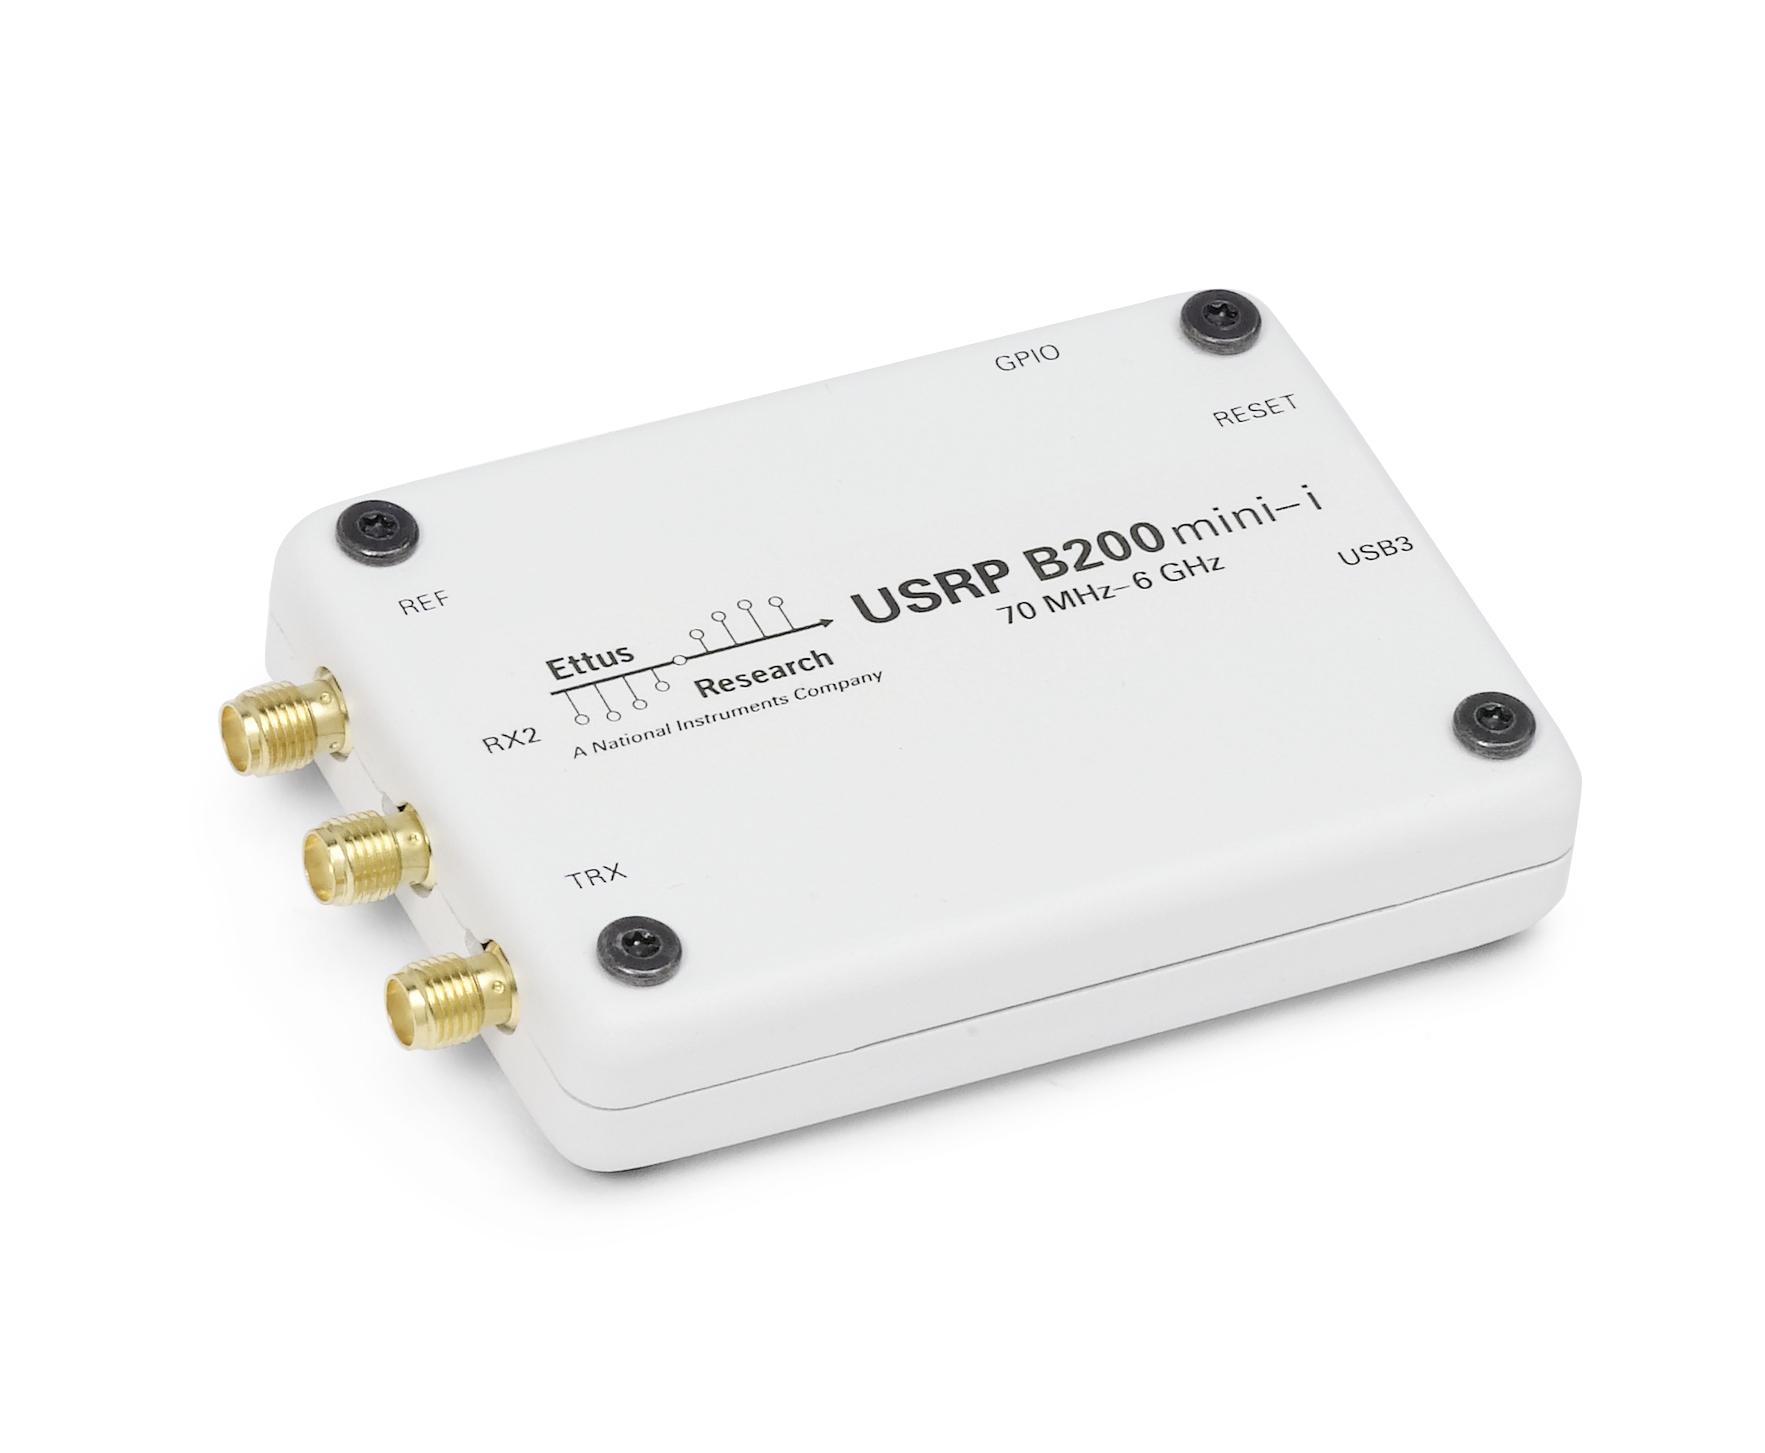 USRP B200mini-i | Ettus Research, a National Instruments Brand | The